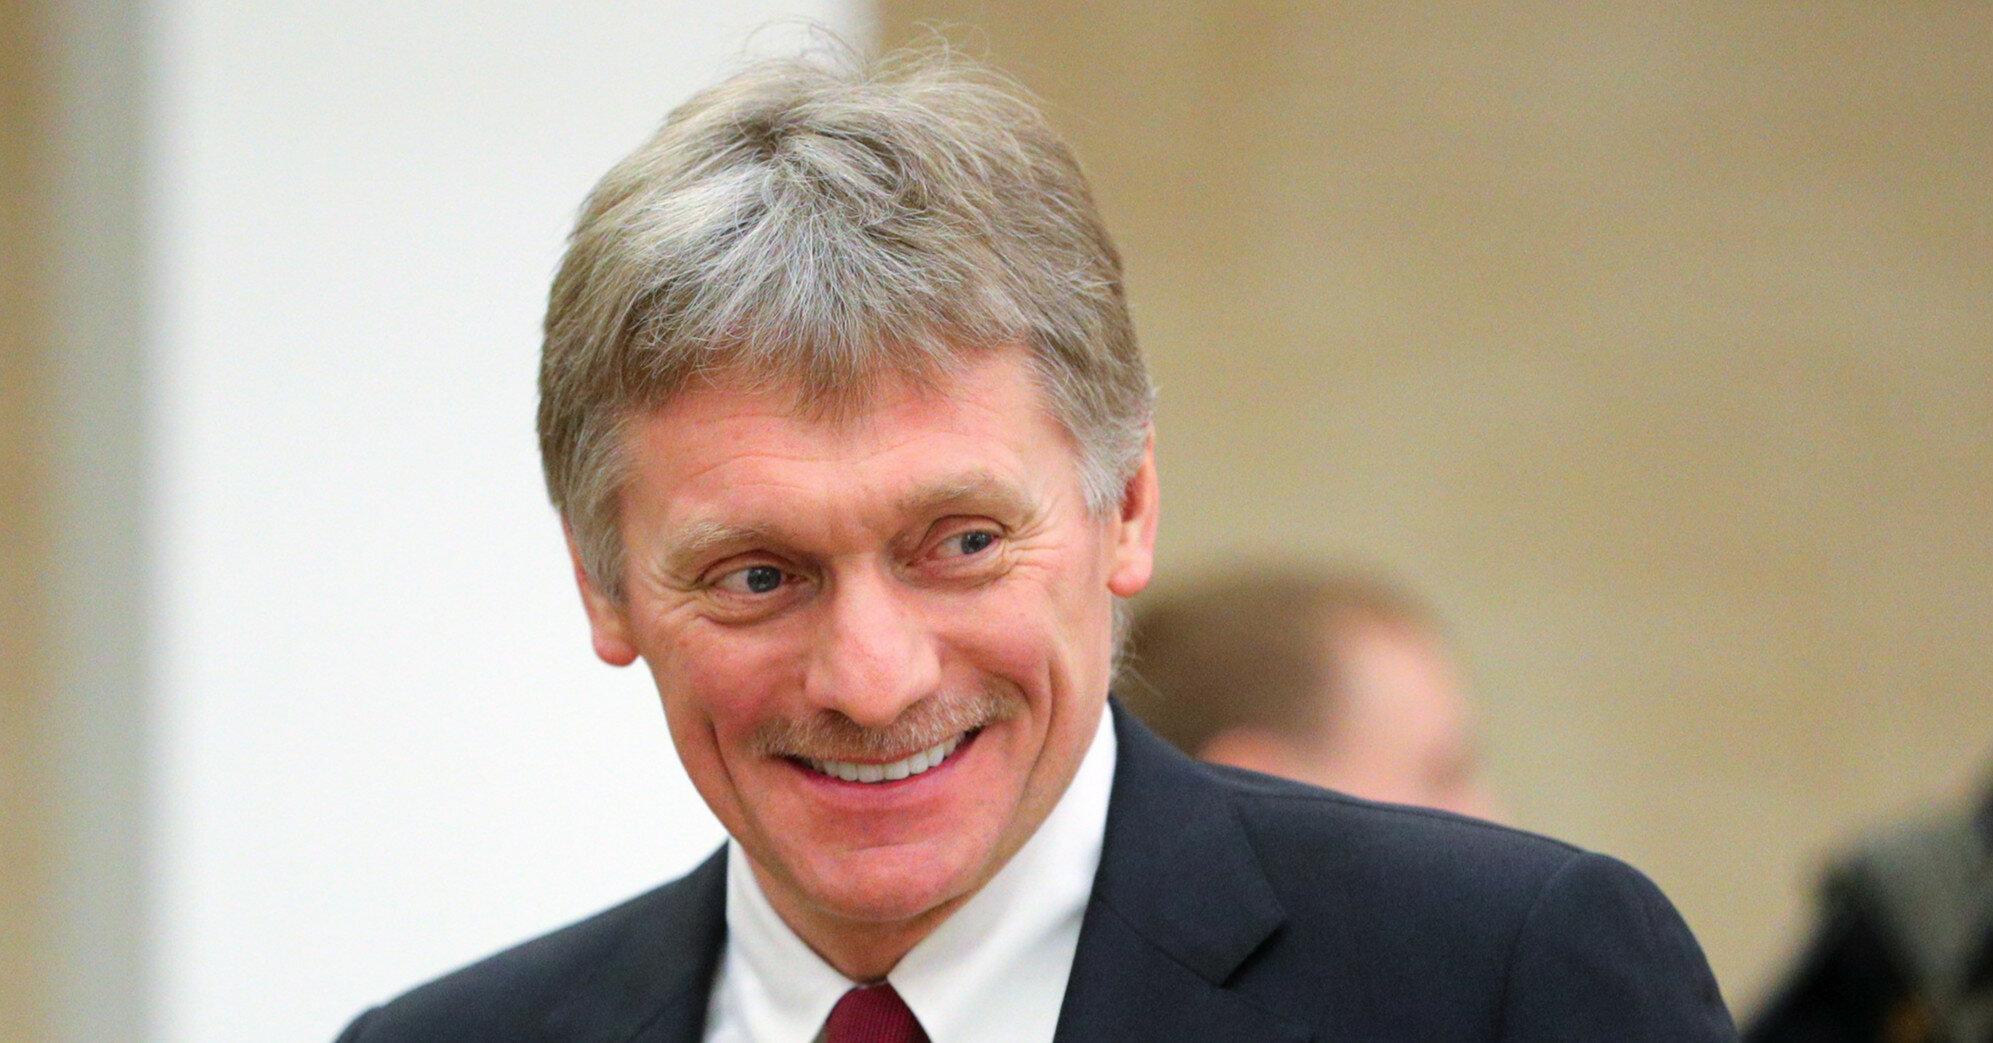 РФ не получала от Киева предложений по встрече Путина с Зеленским, - Песков